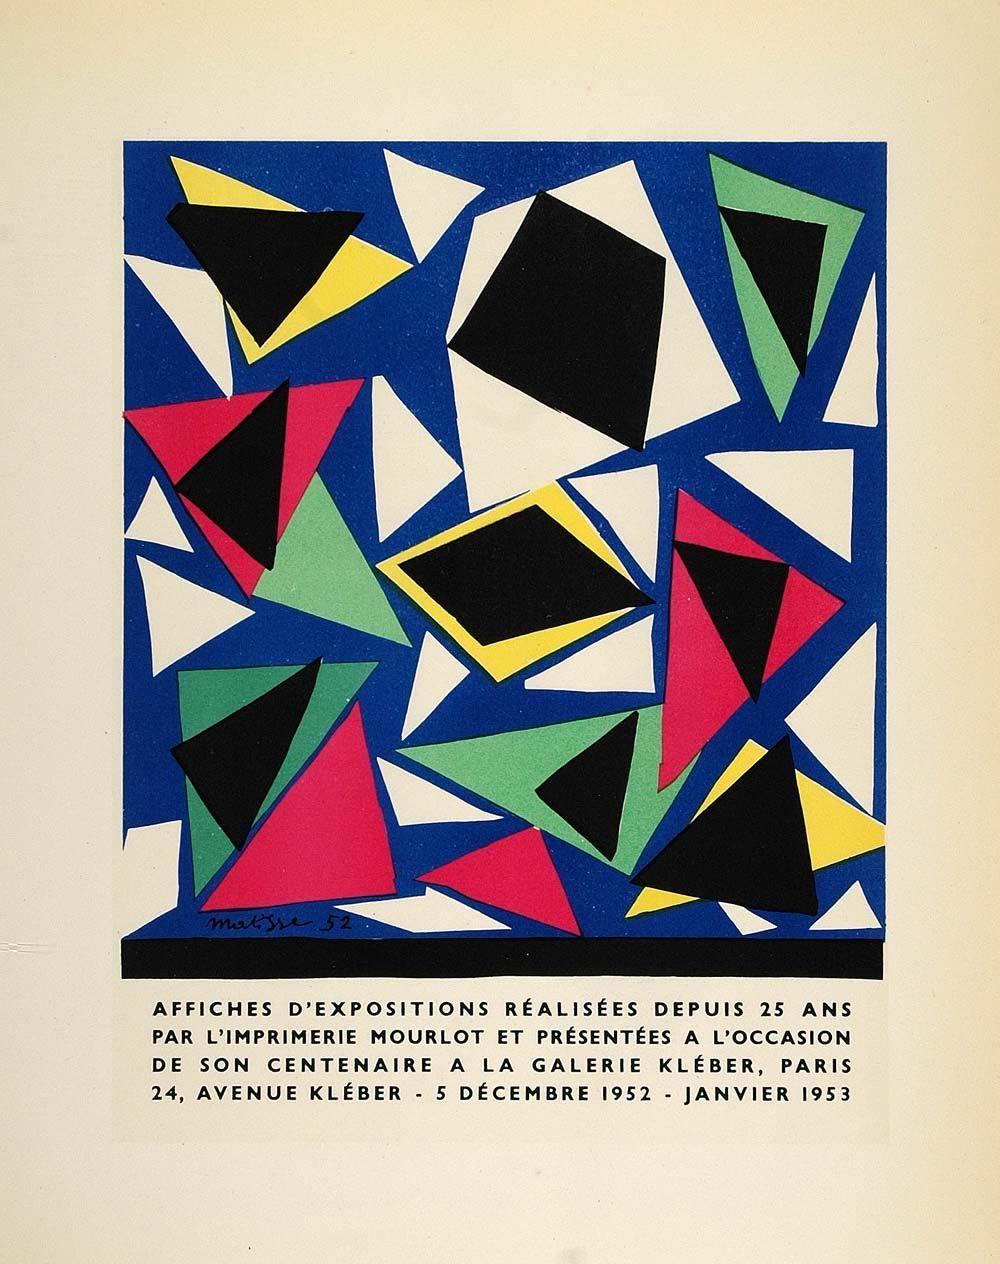 1959 Lithograph Henri Matisse Poster Art Abstract Galerie Kleber Mourl - Period Paper